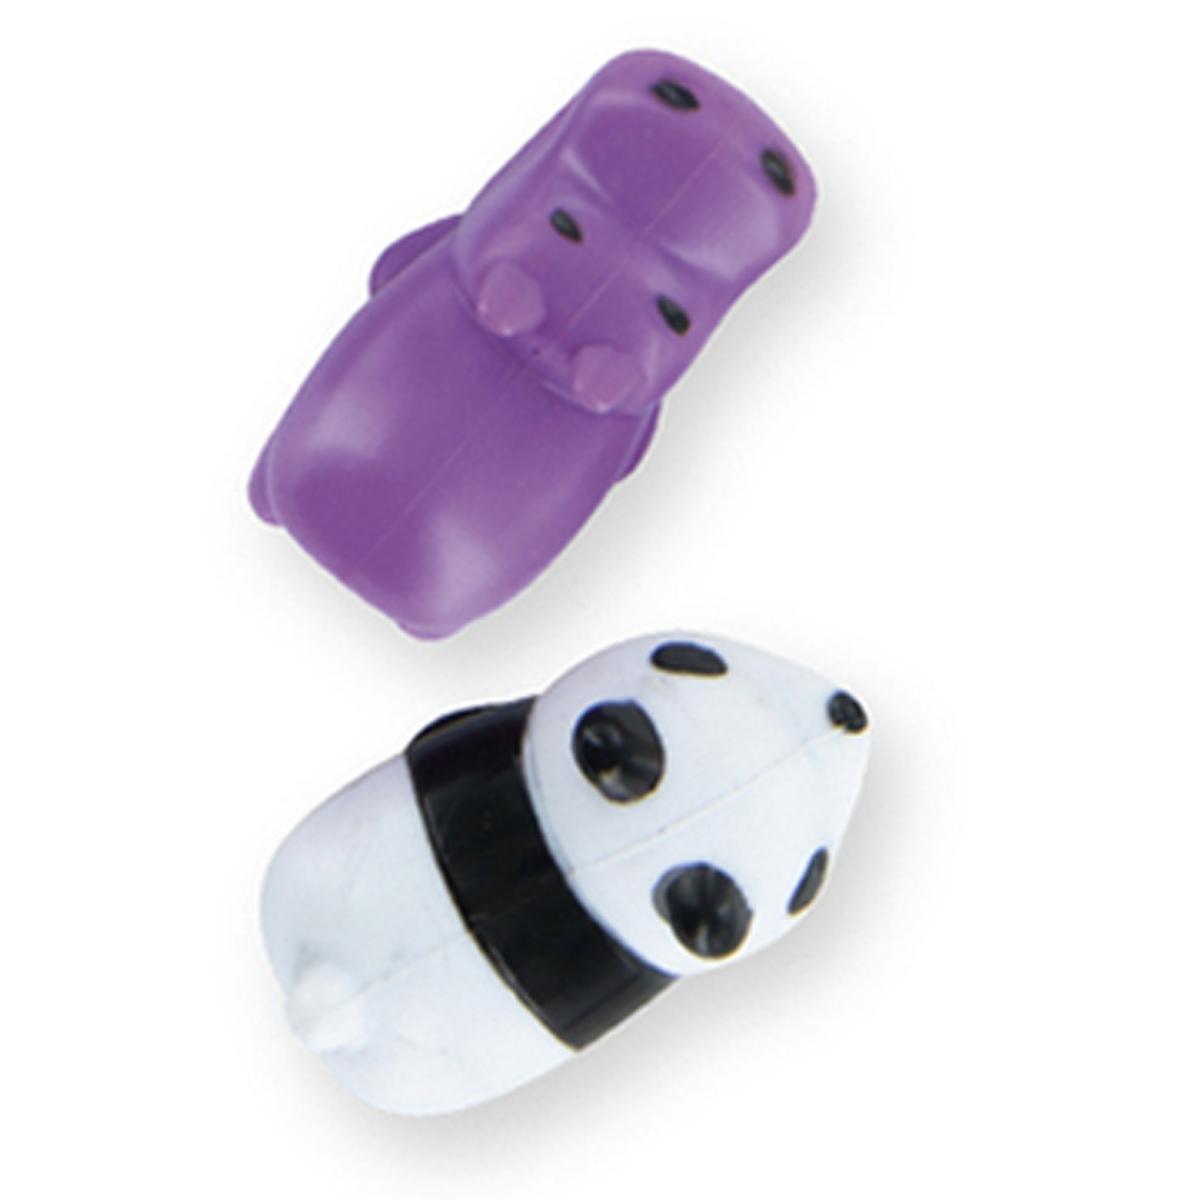 Duo protège-cables silicone \'Animaux\' (hippopotame, panda) violet blanc - pour cable USB jack 35 mm - [A1689]